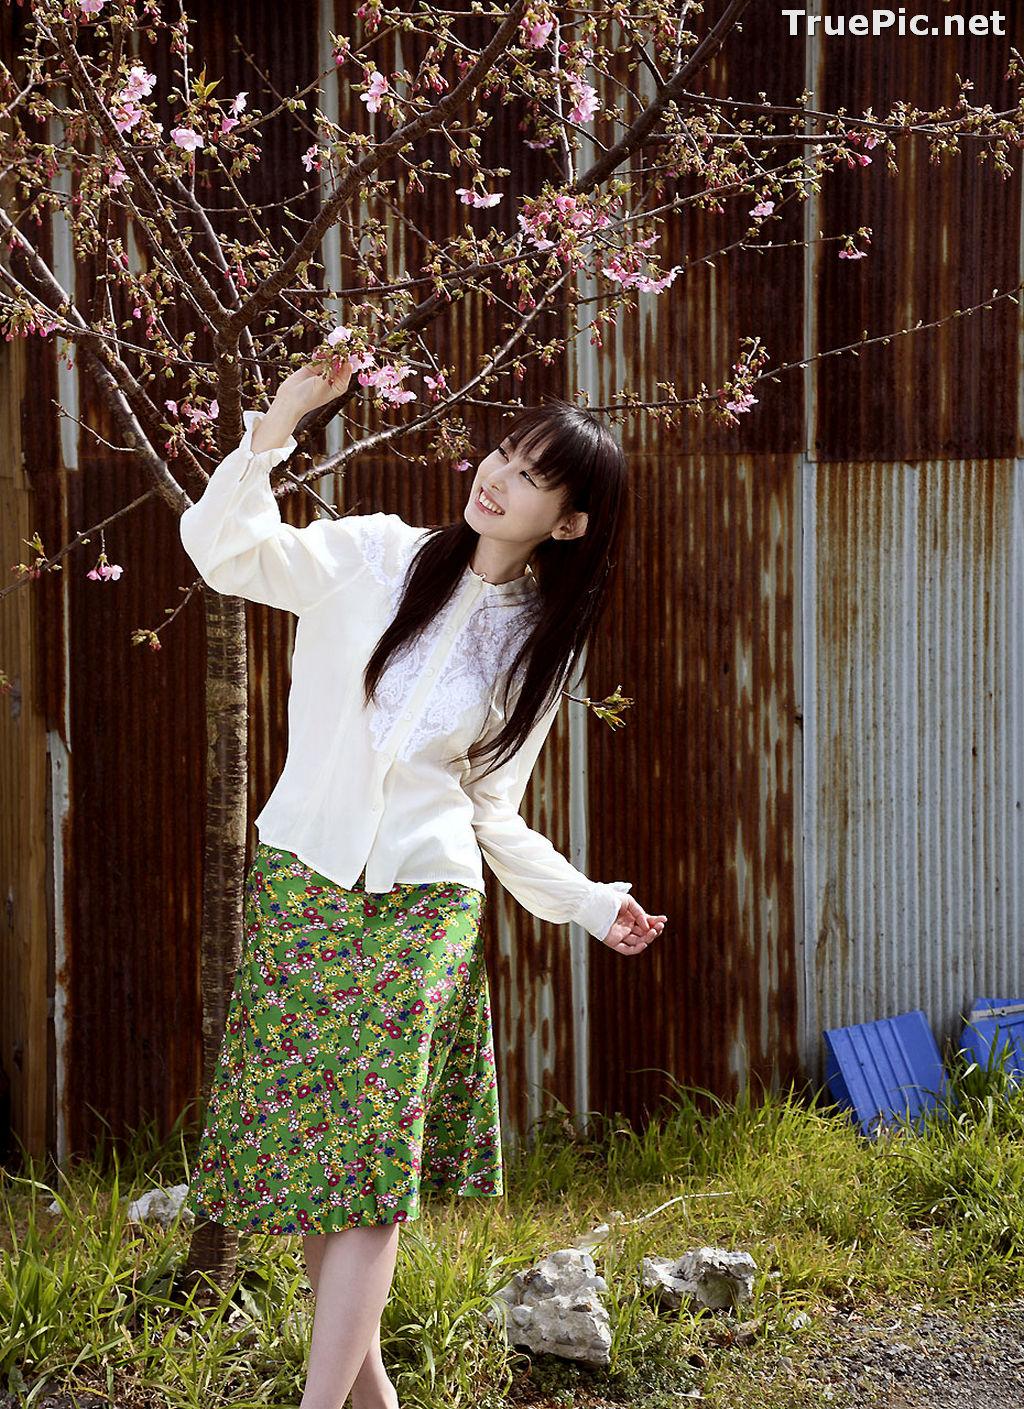 Image Image-TV Album Waiting for Me - Japanese Actress and Gravure Idol - Rina Akiyama - TruePic.net - Picture-1